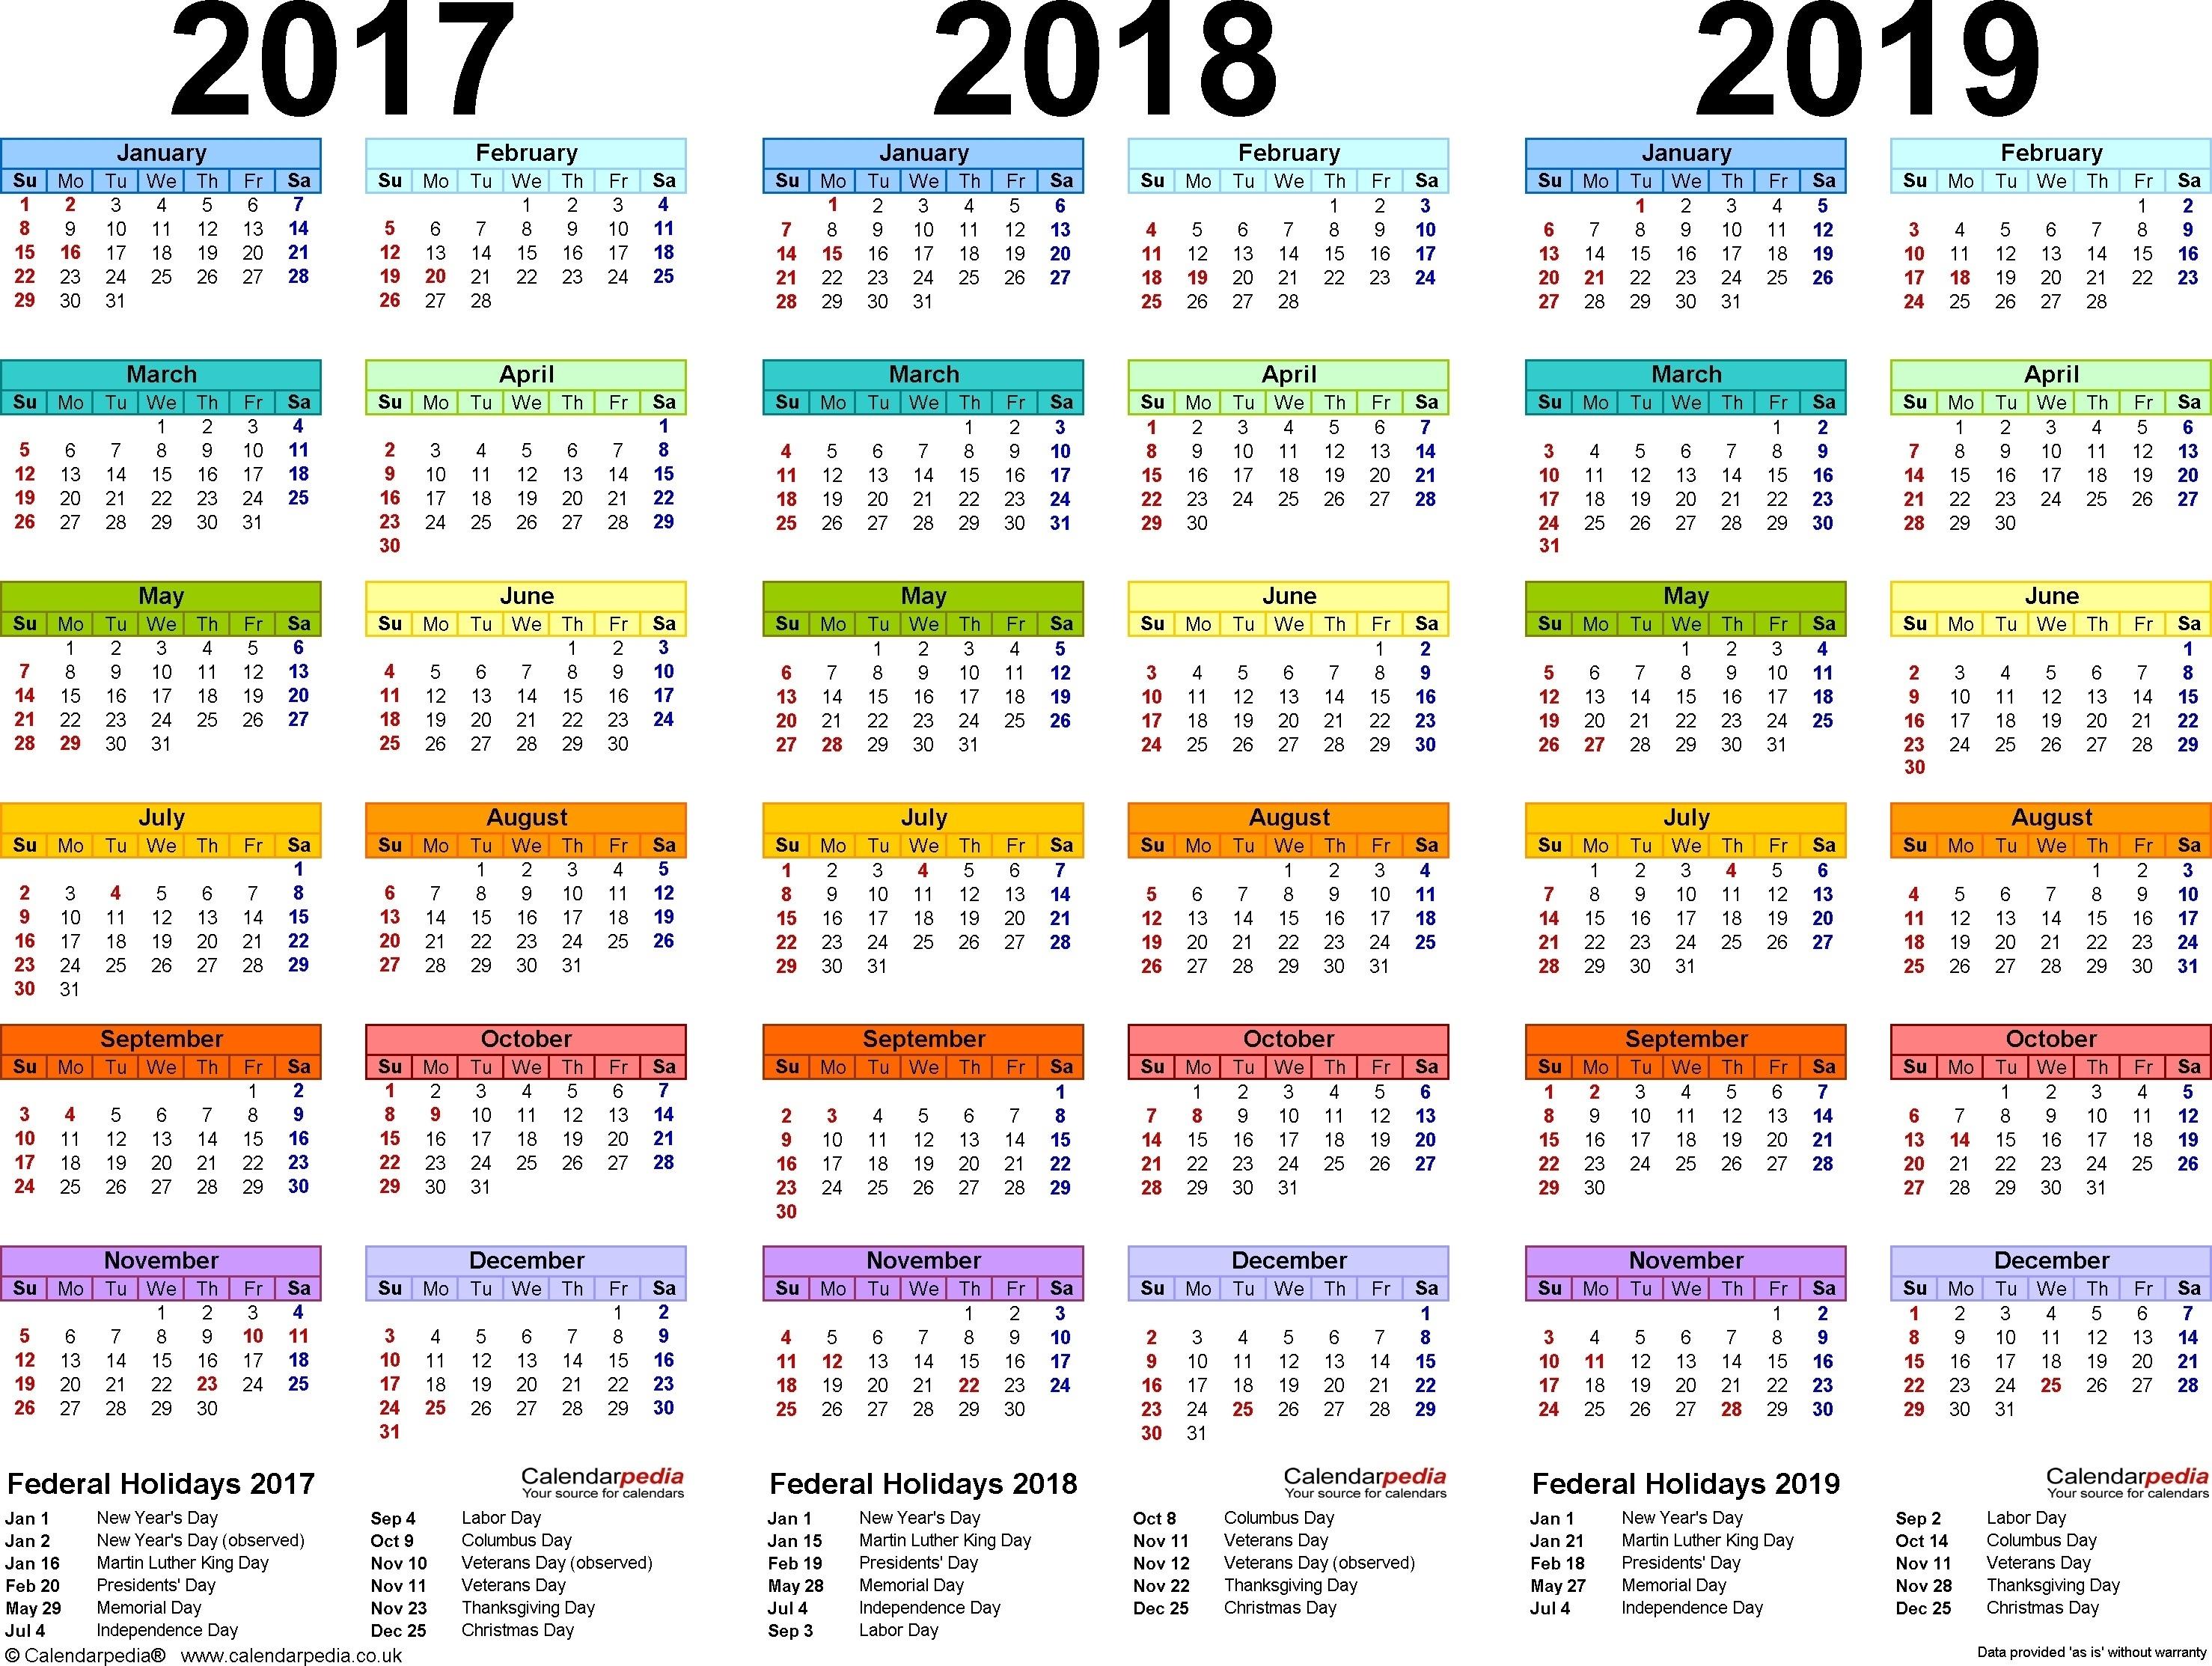 Depo Shot Schedule Chart - Caska Perpetual Contraceptive Injection Calendar